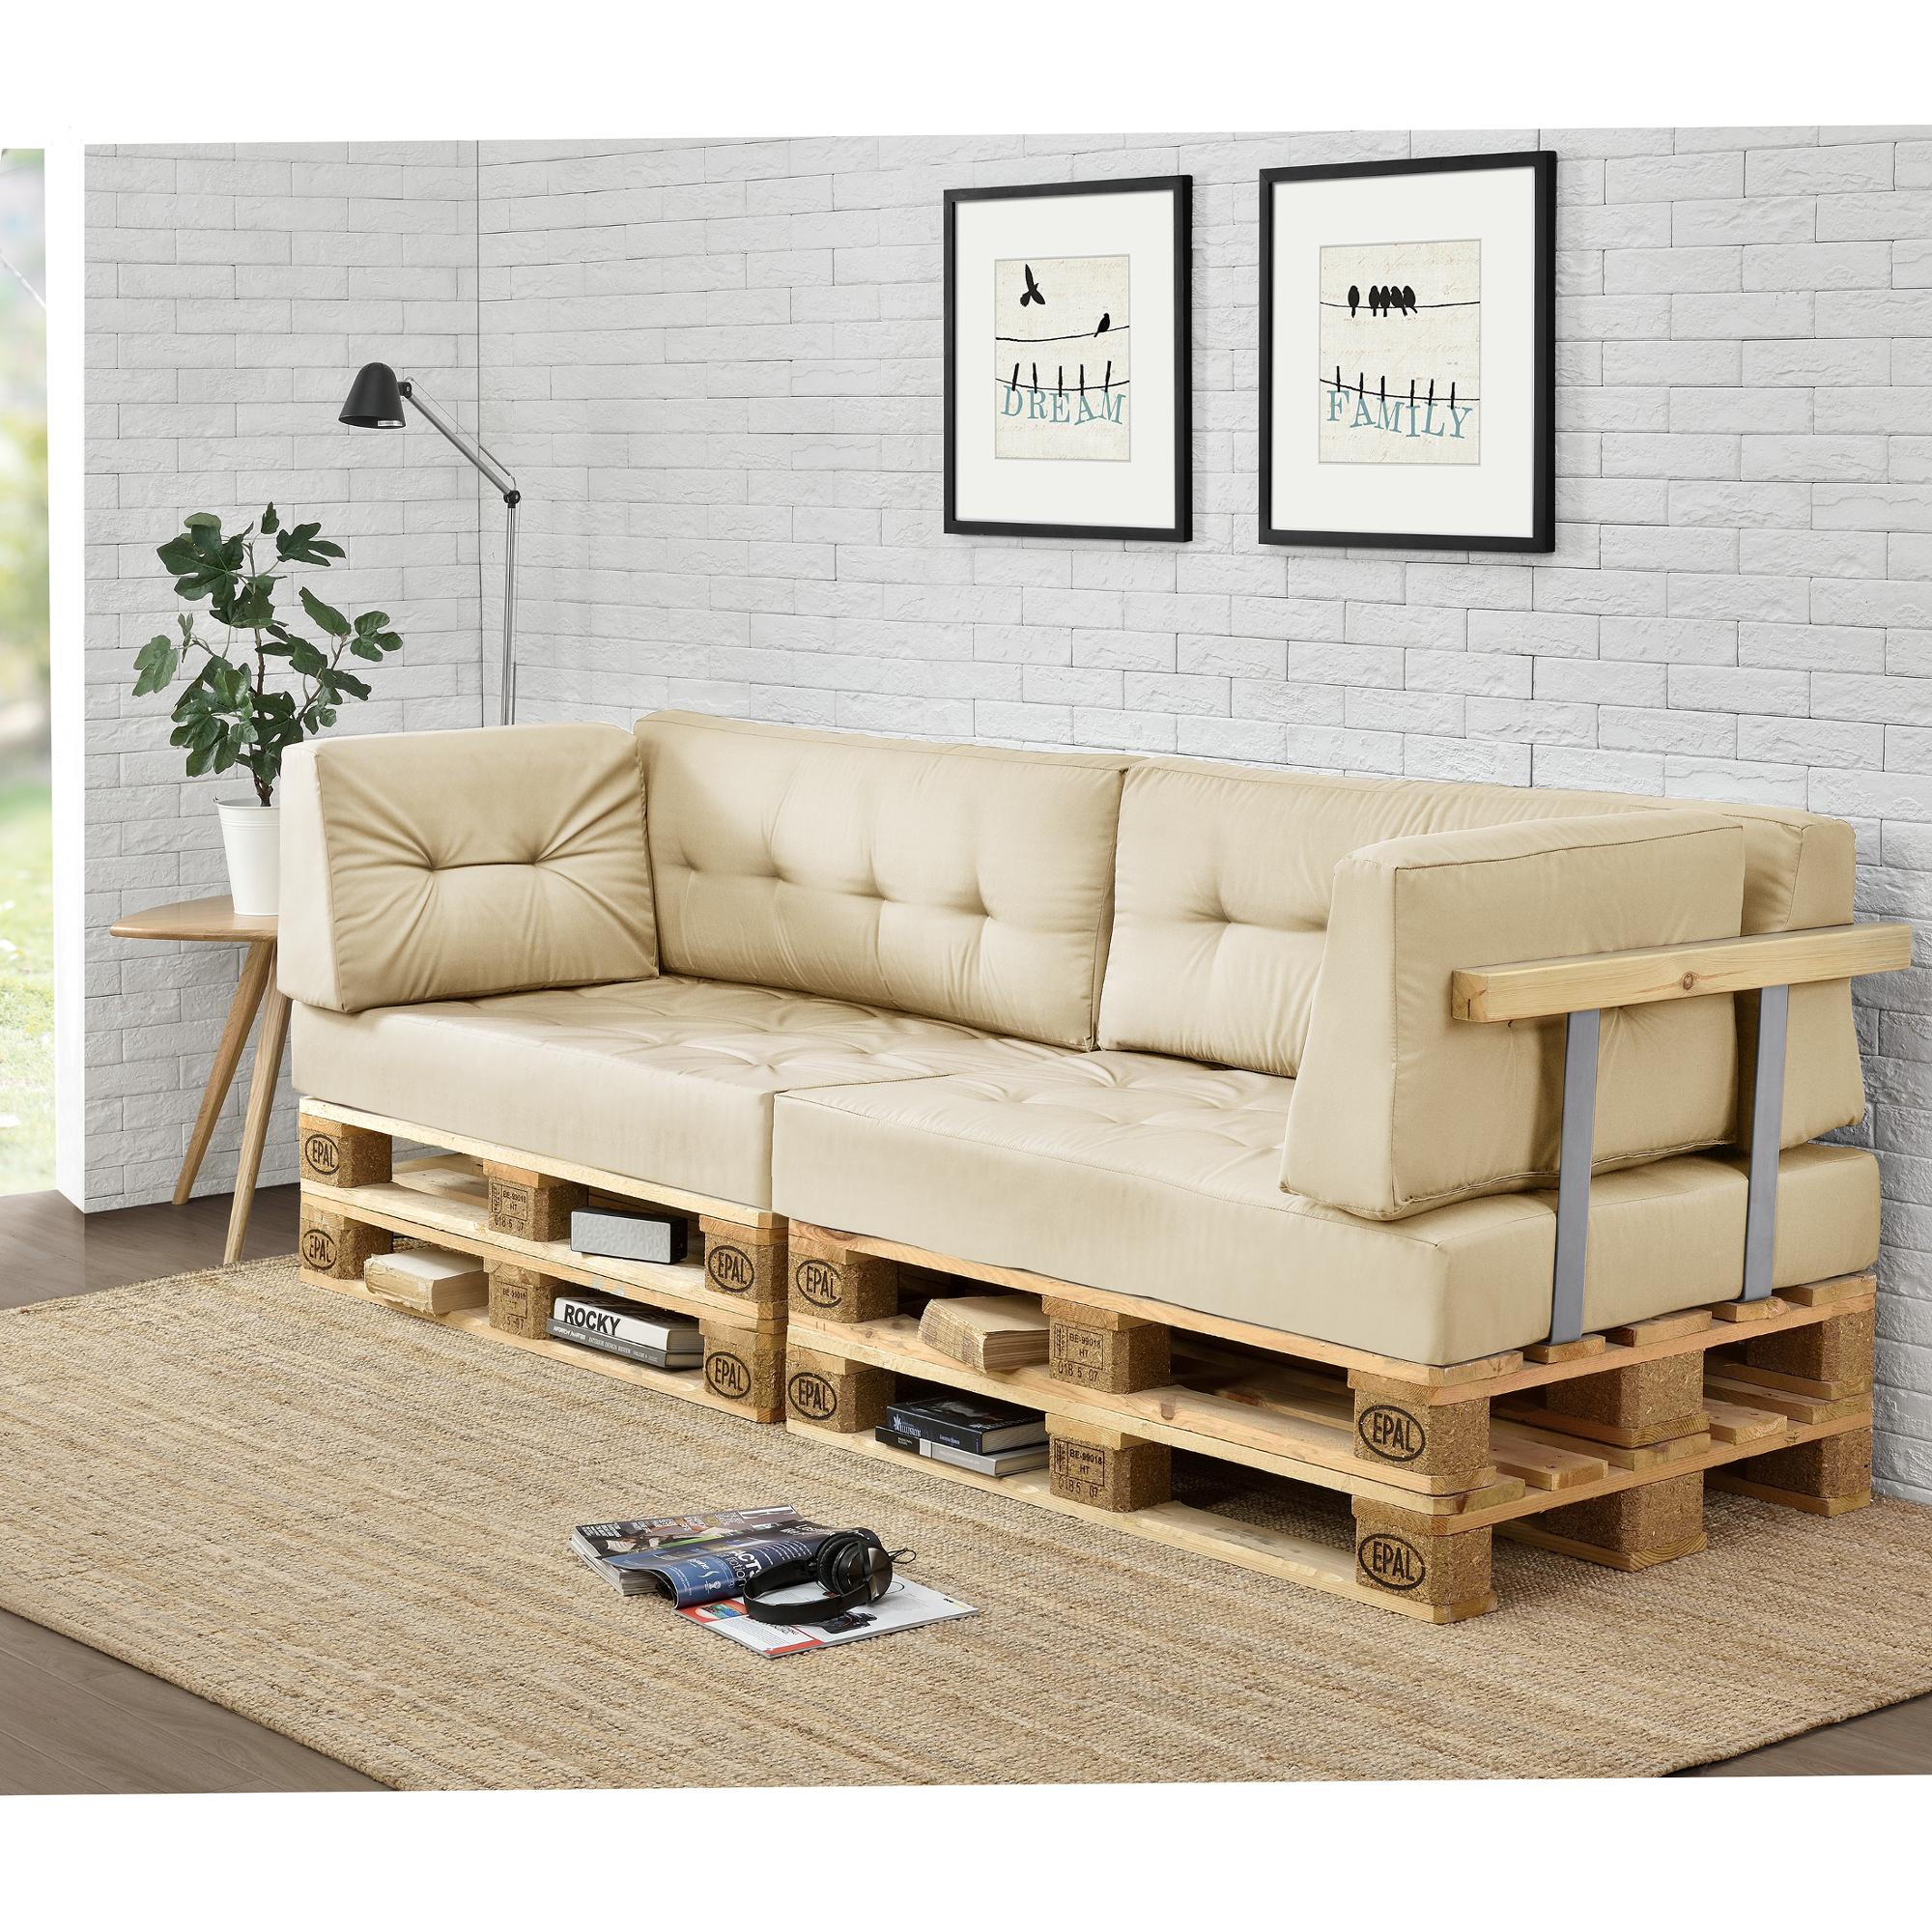 Palettenkissen in outdoor paletten kissen sofa for Sofa para exterior